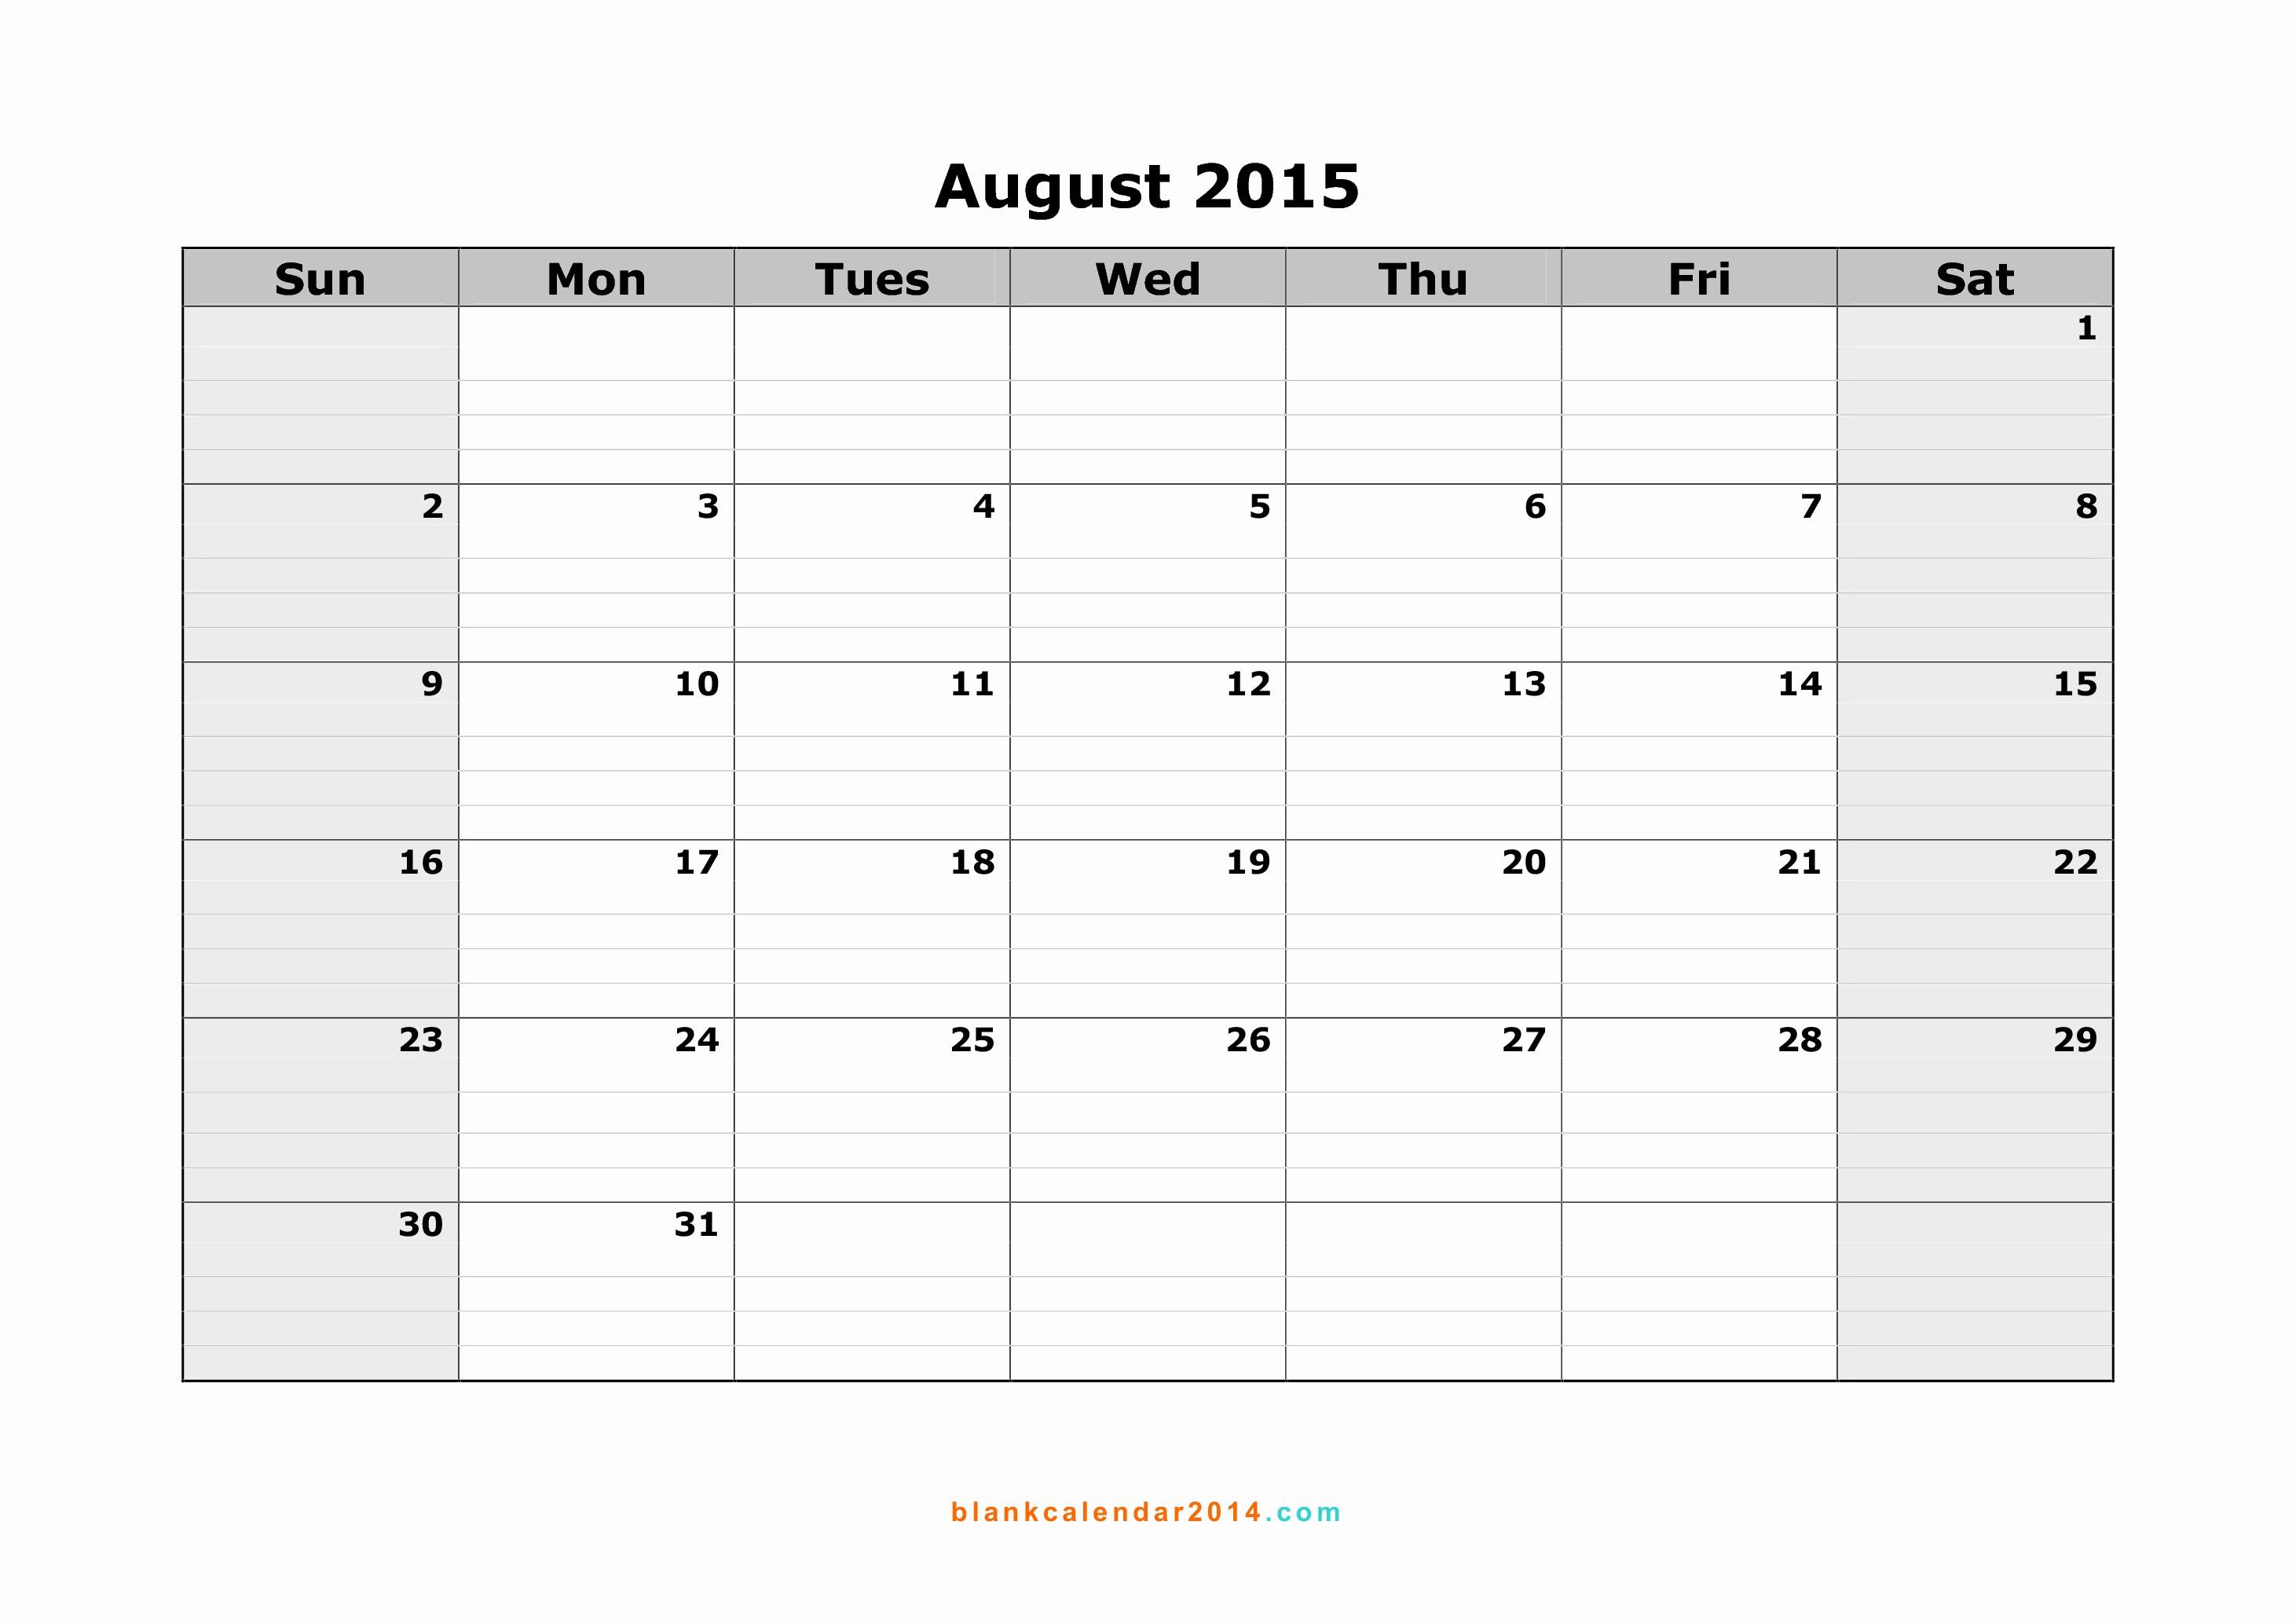 Free Calendar Templates August 2015 Luxury 8 Best Of August 2015 Calendar Free Printable Cute